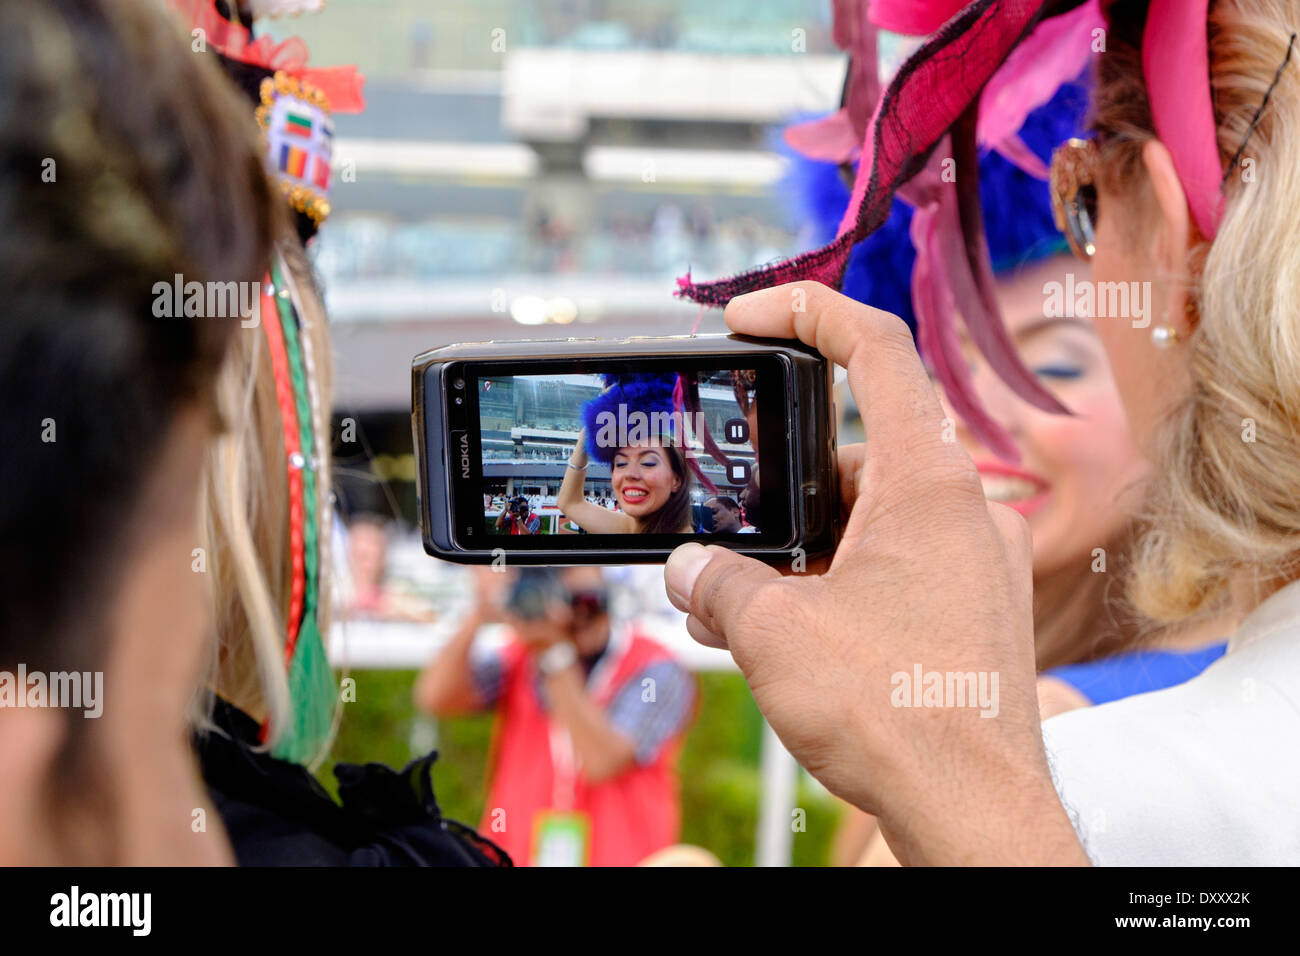 Femmina di spettatori a Dubai World Cup Horse Racing Championship all Ippodromo di Meydan in Dubai Emirati Arabi Uniti Immagini Stock